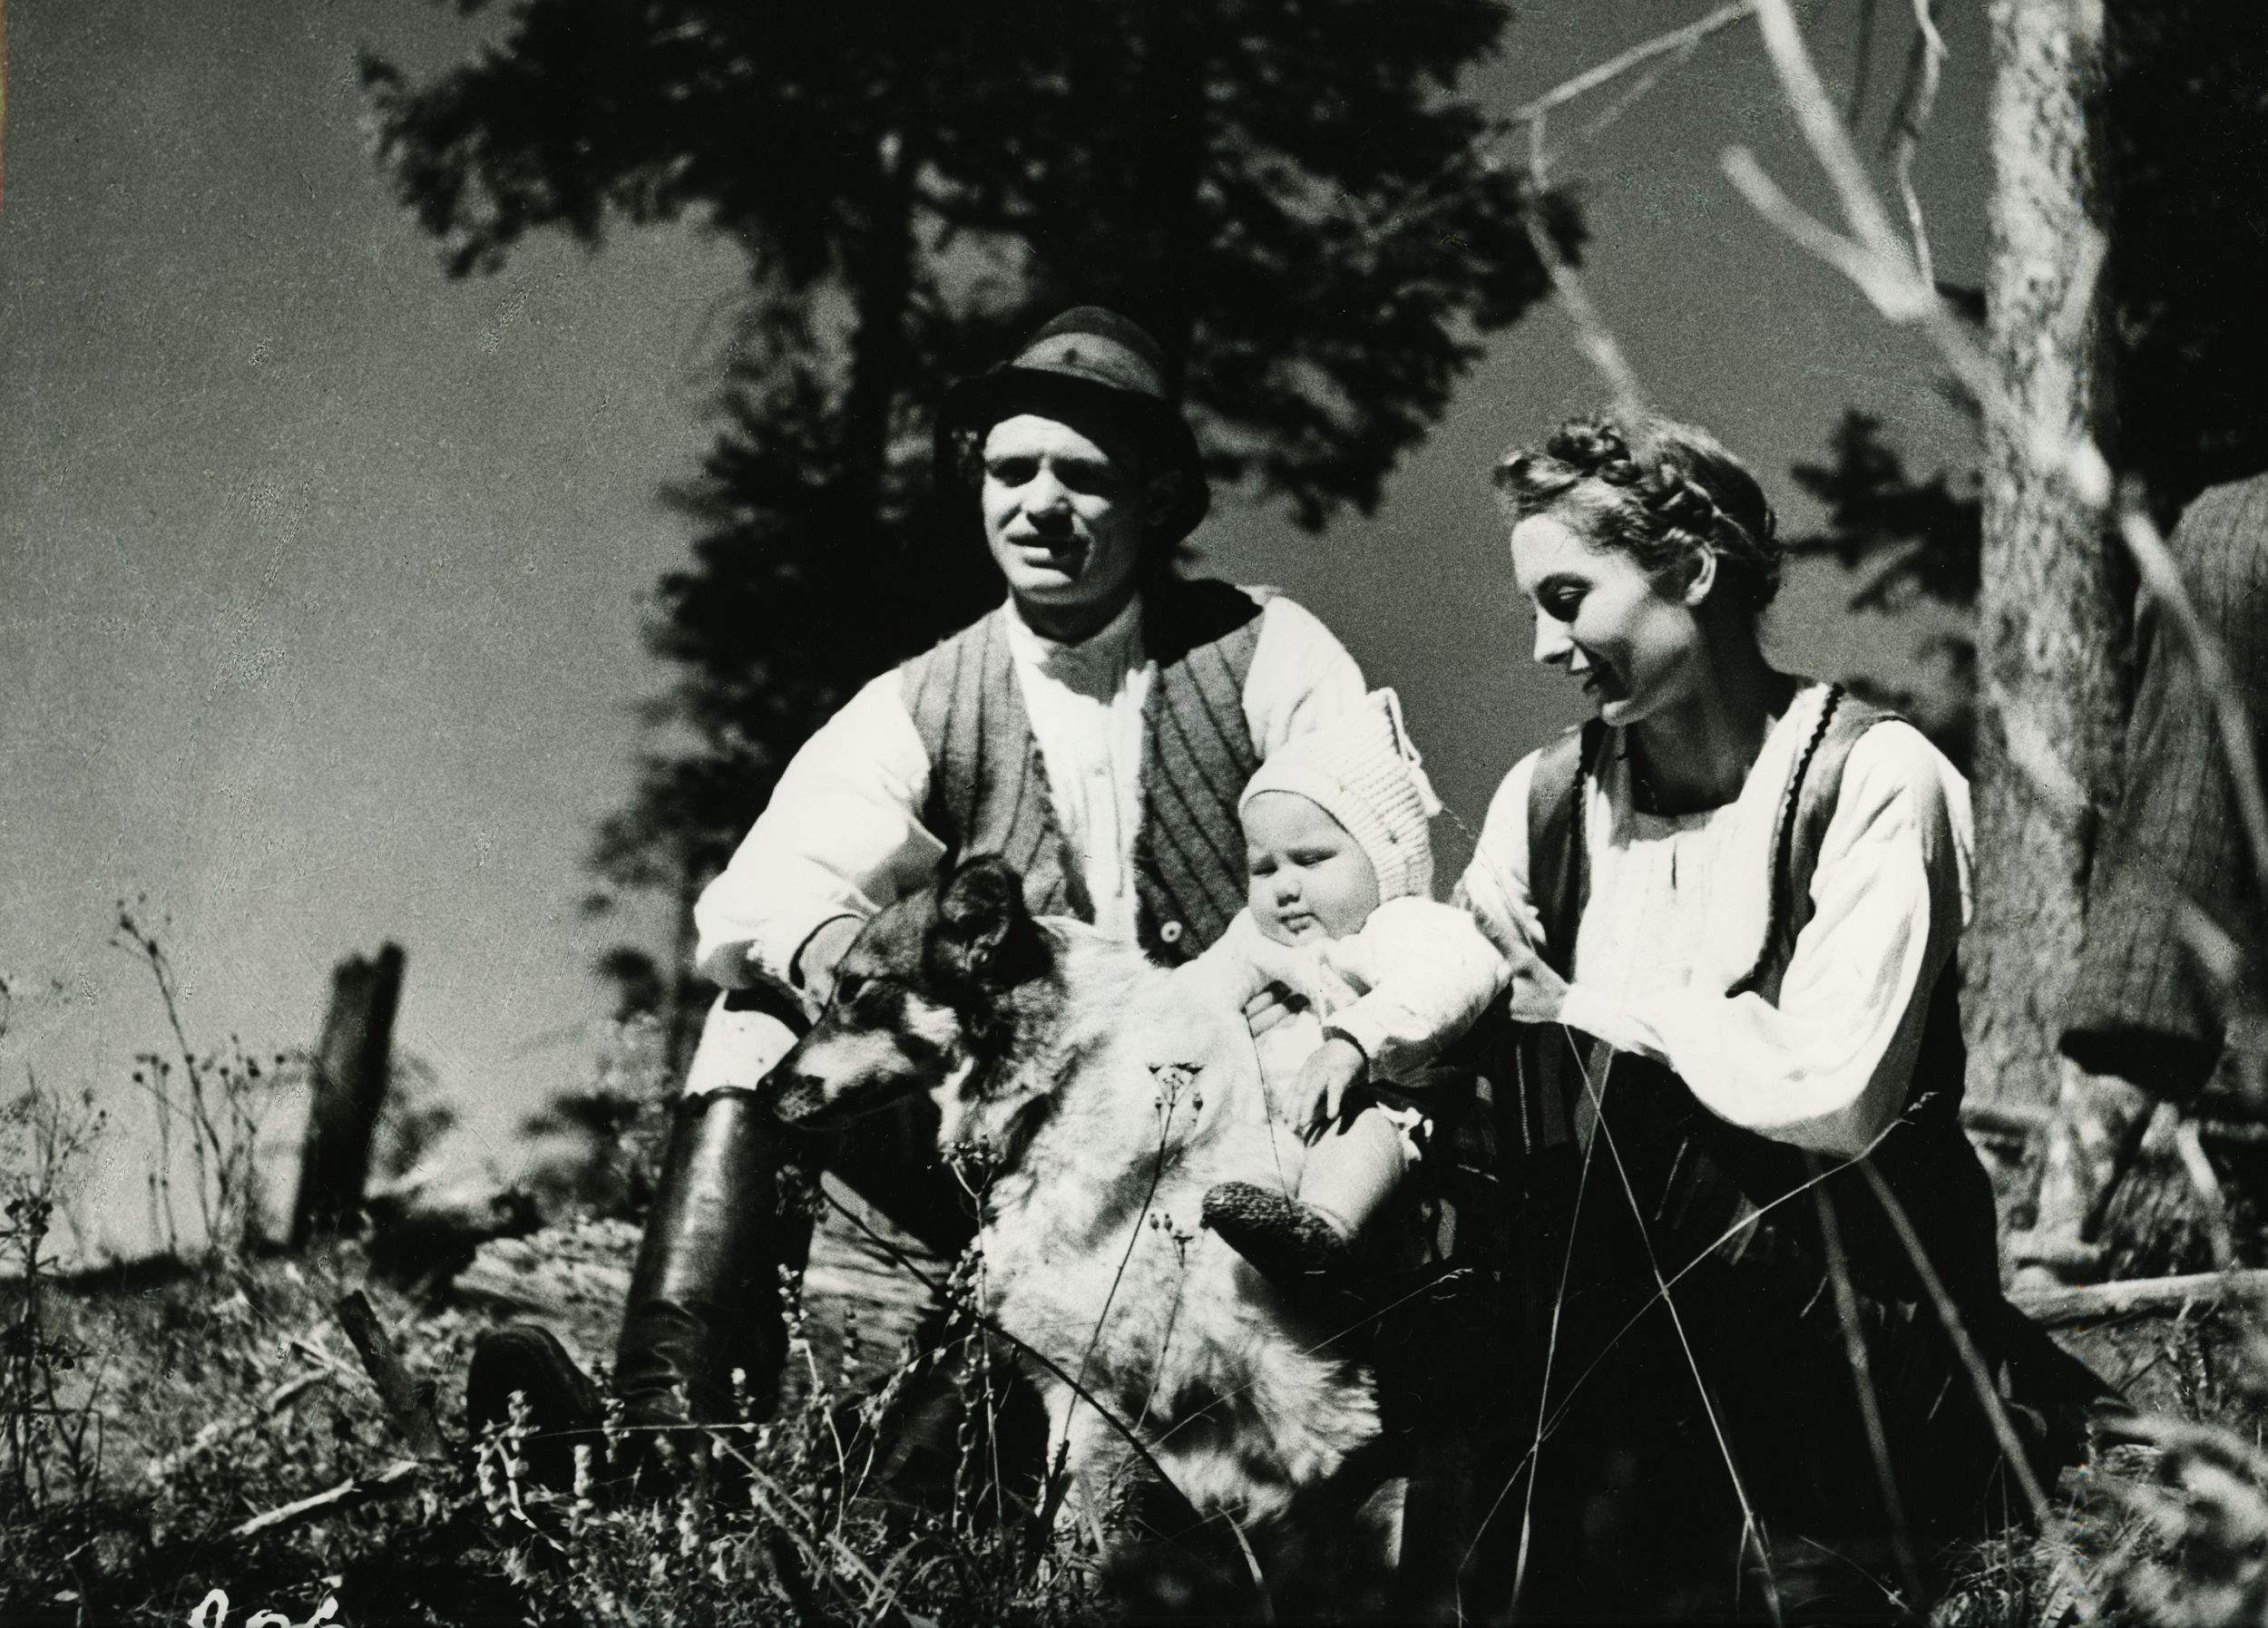 'Uomini della montagna' (1942); regia: István Szőts. Titolo originale: 'Emberek a havason'